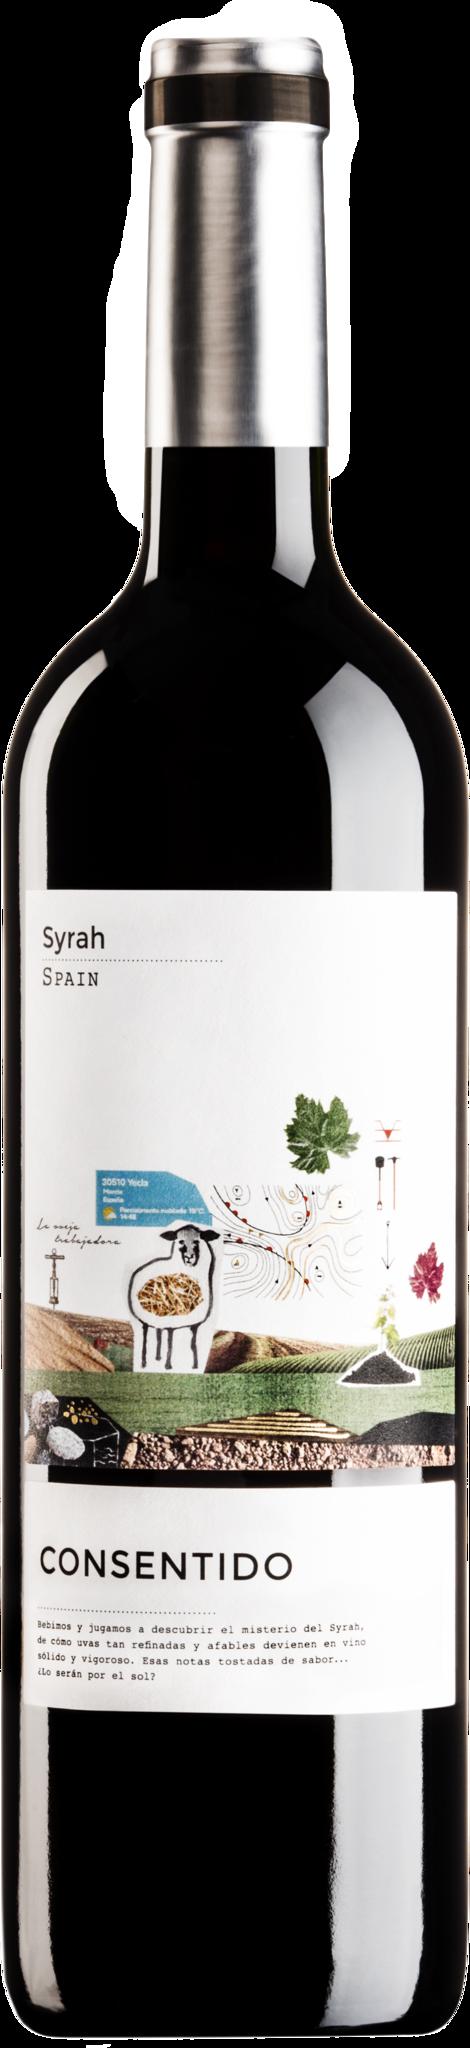 Consentido Syrah 2019-1